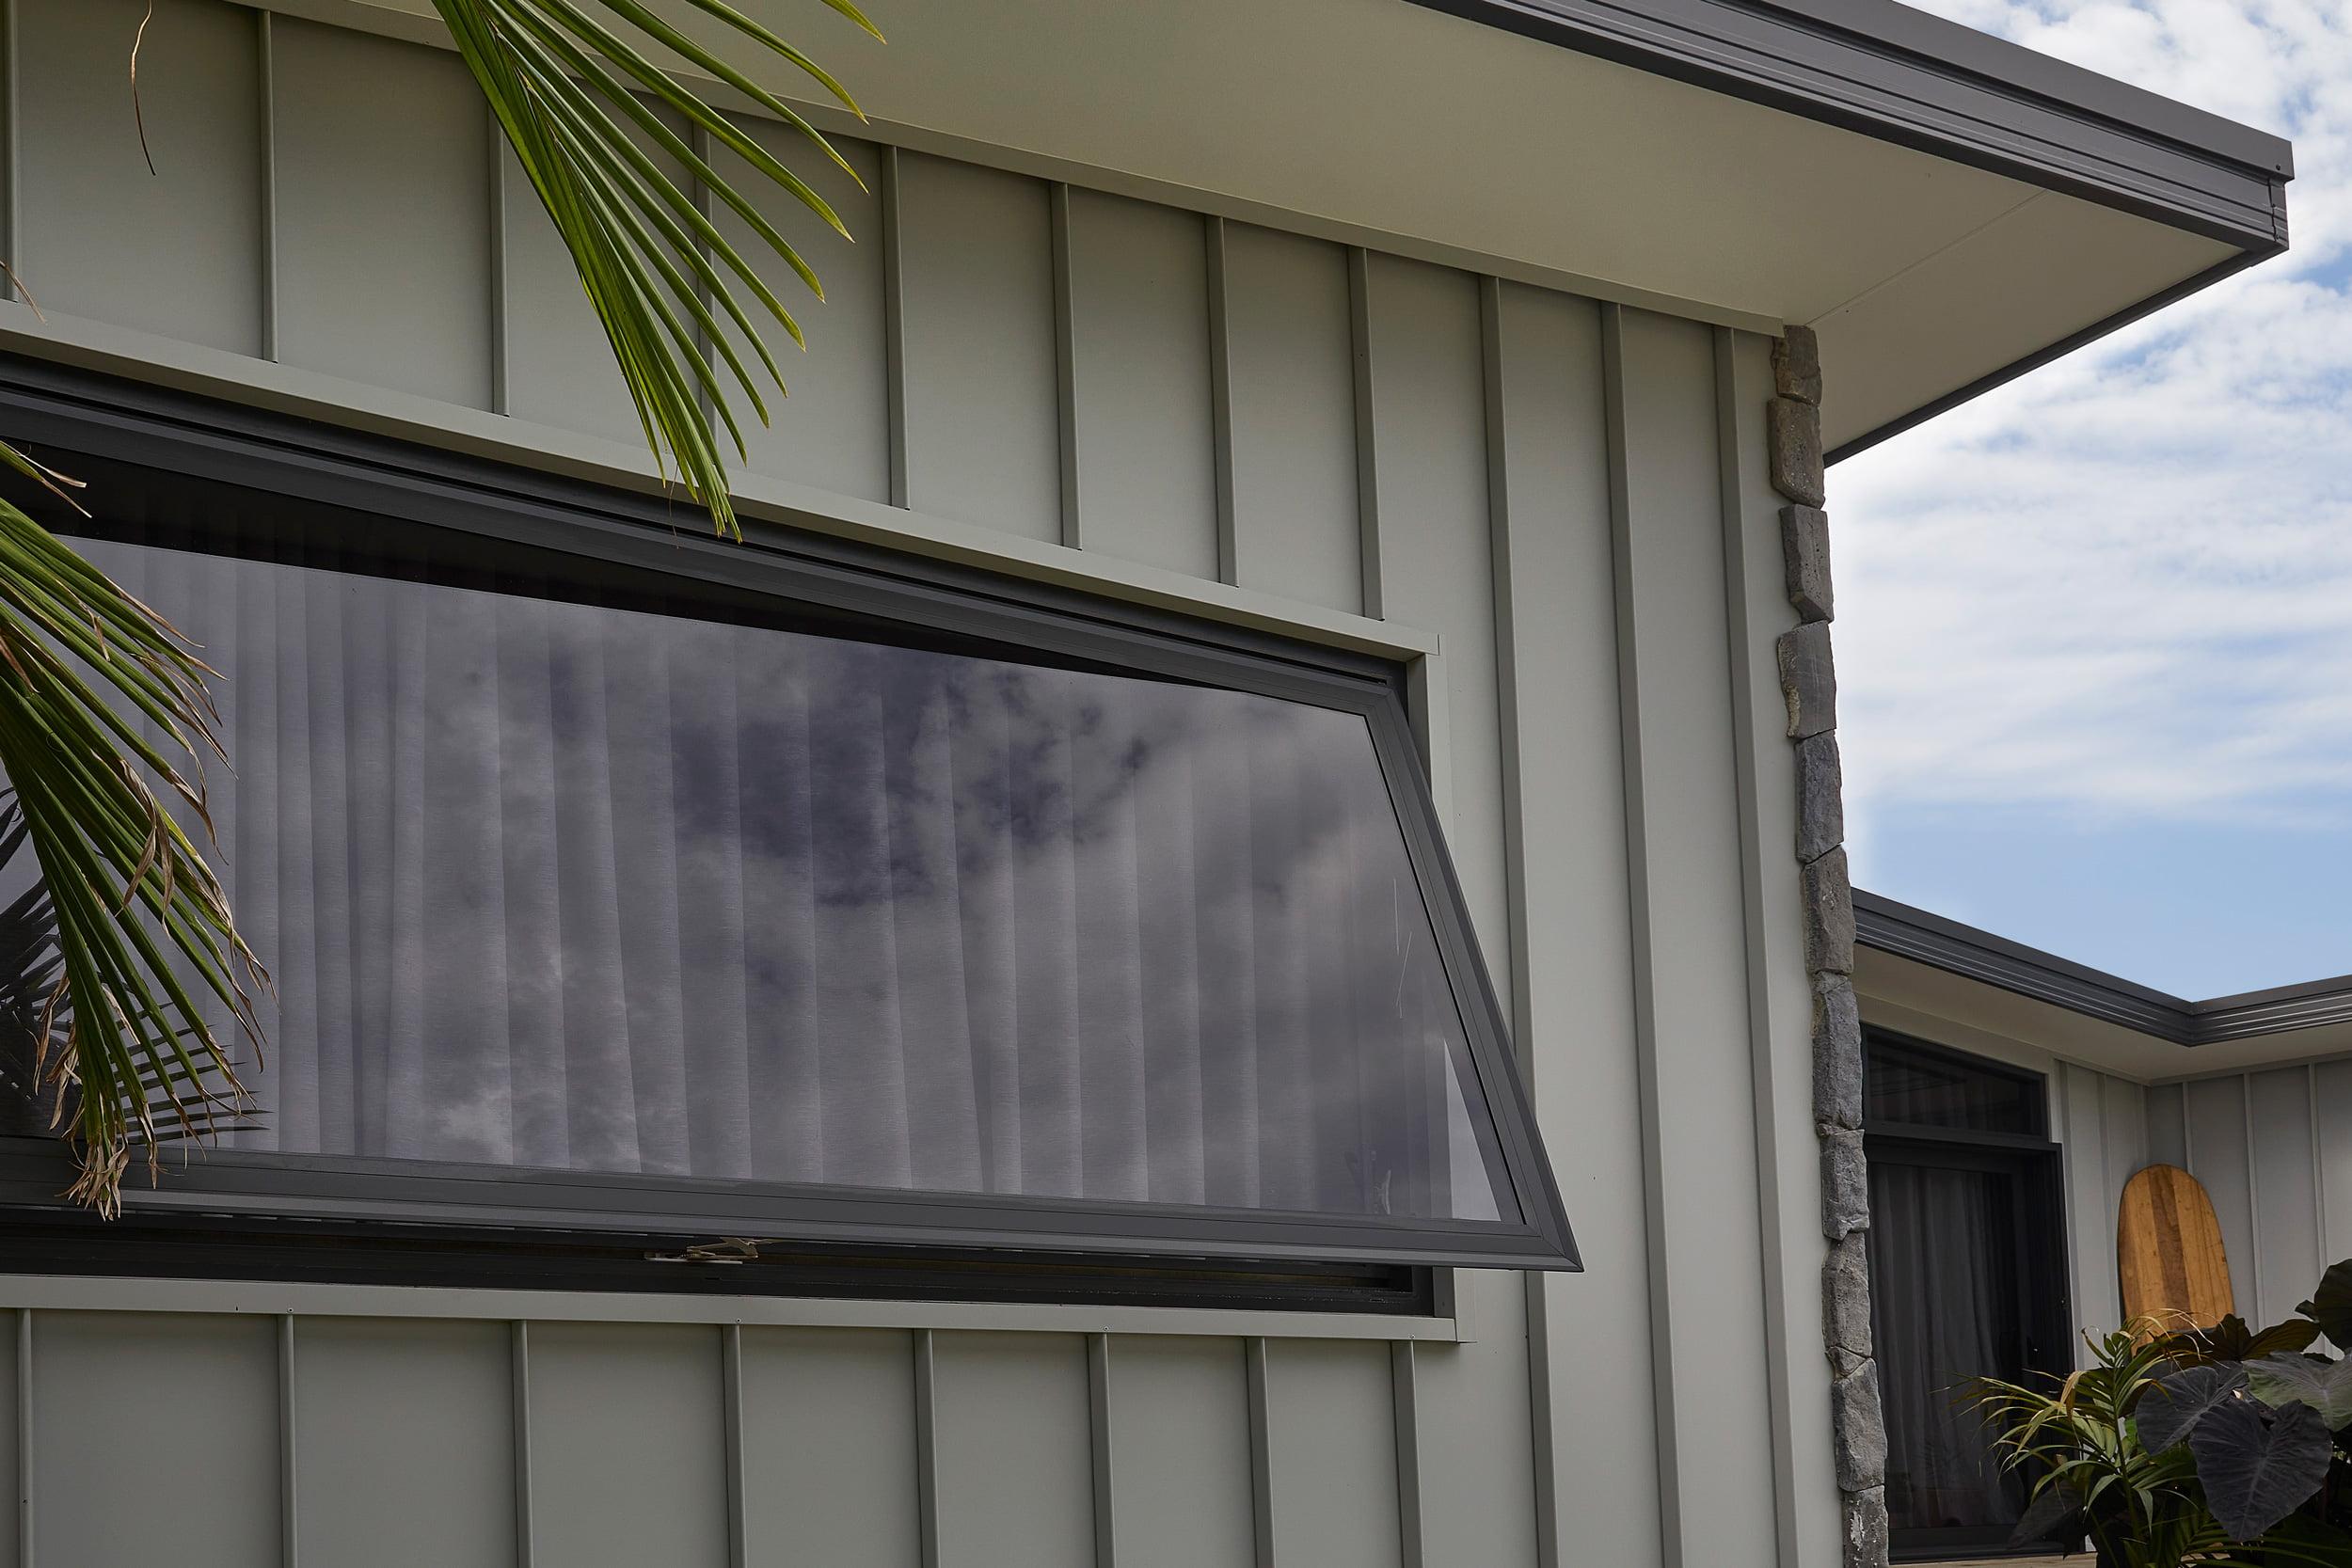 Paragon awning window in Monument Matt